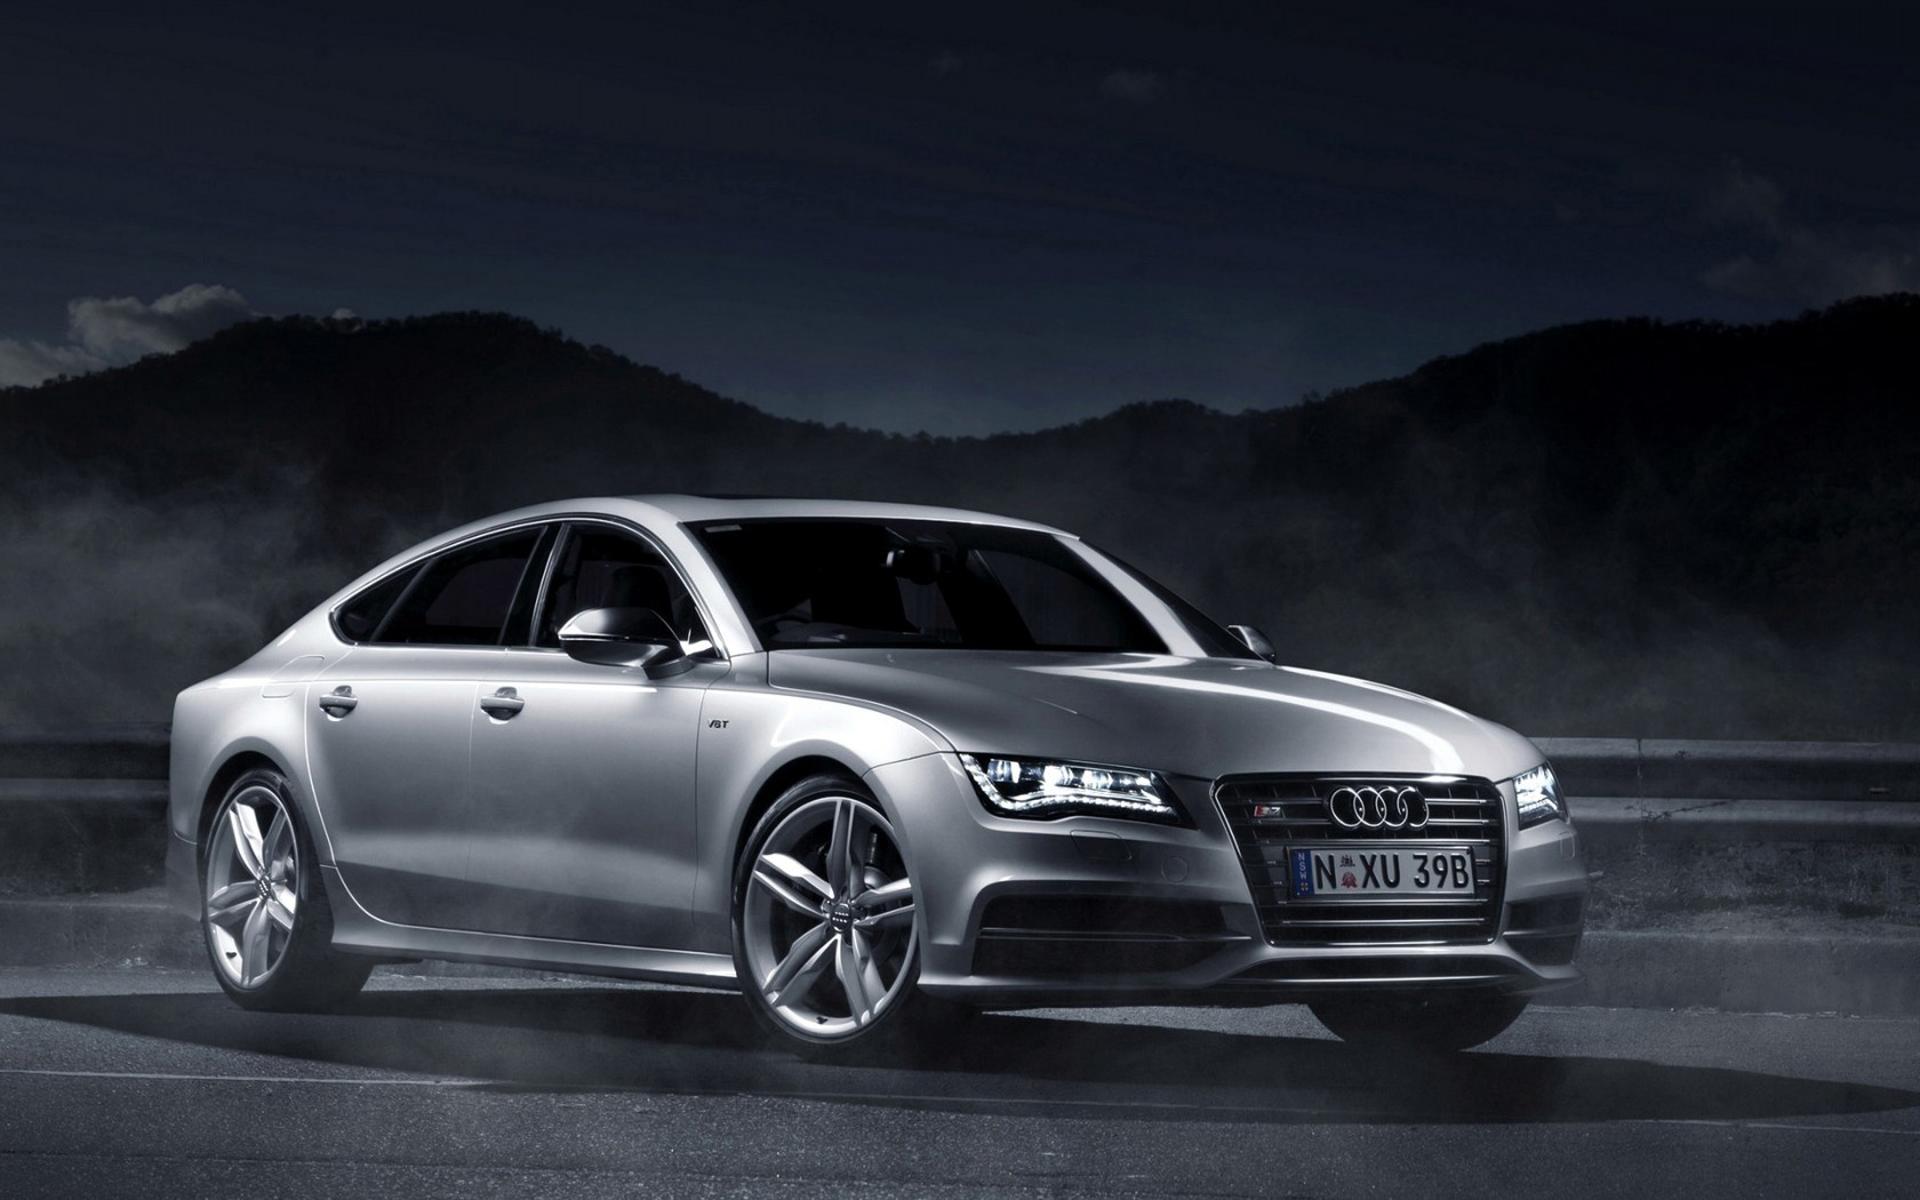 3 Audi S7 HD Wallpapers Hintergrnde Wallpaper Abyss